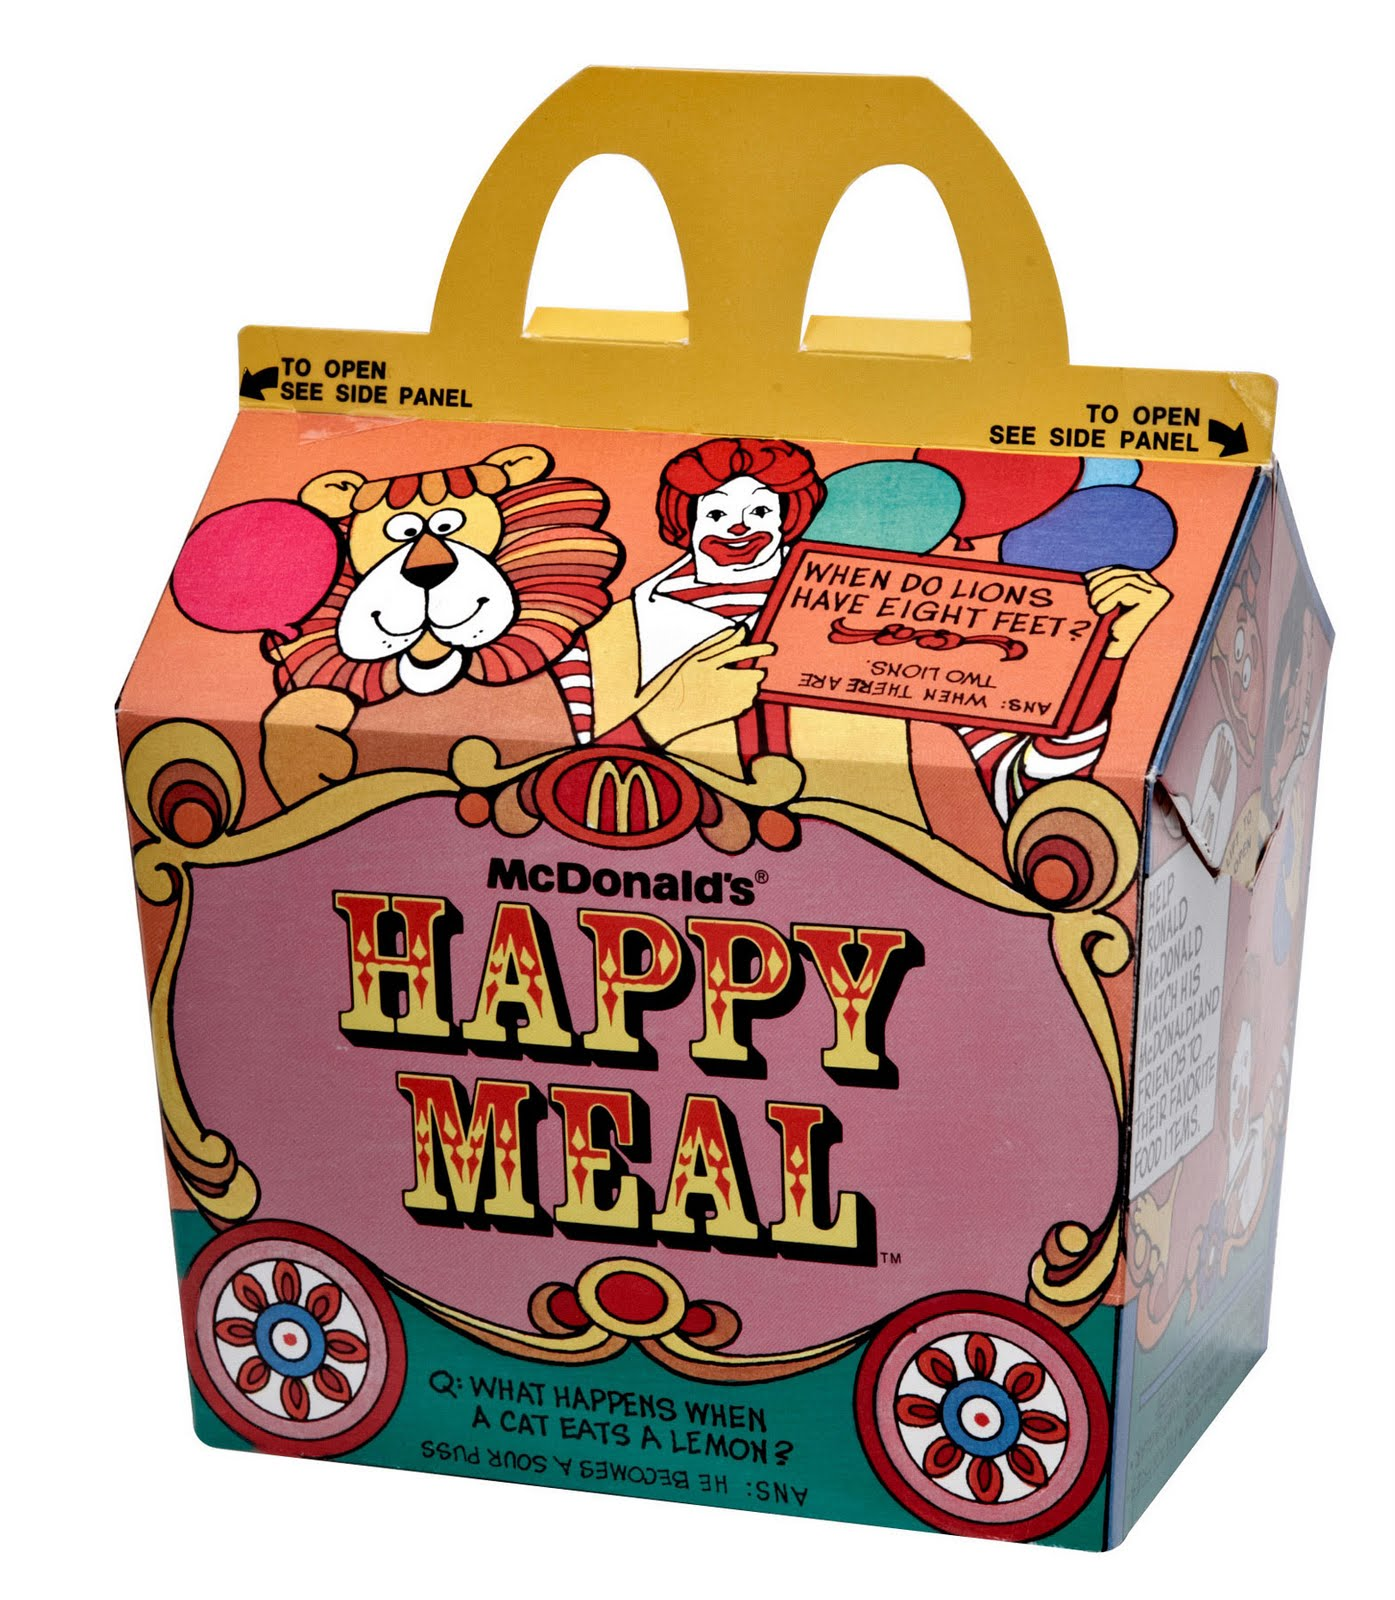 Préférence 17 ORIGINAL HAPPY MEAL BOX, MEAL HAPPY BOX ORIGINAL | HappyMeal OZ95